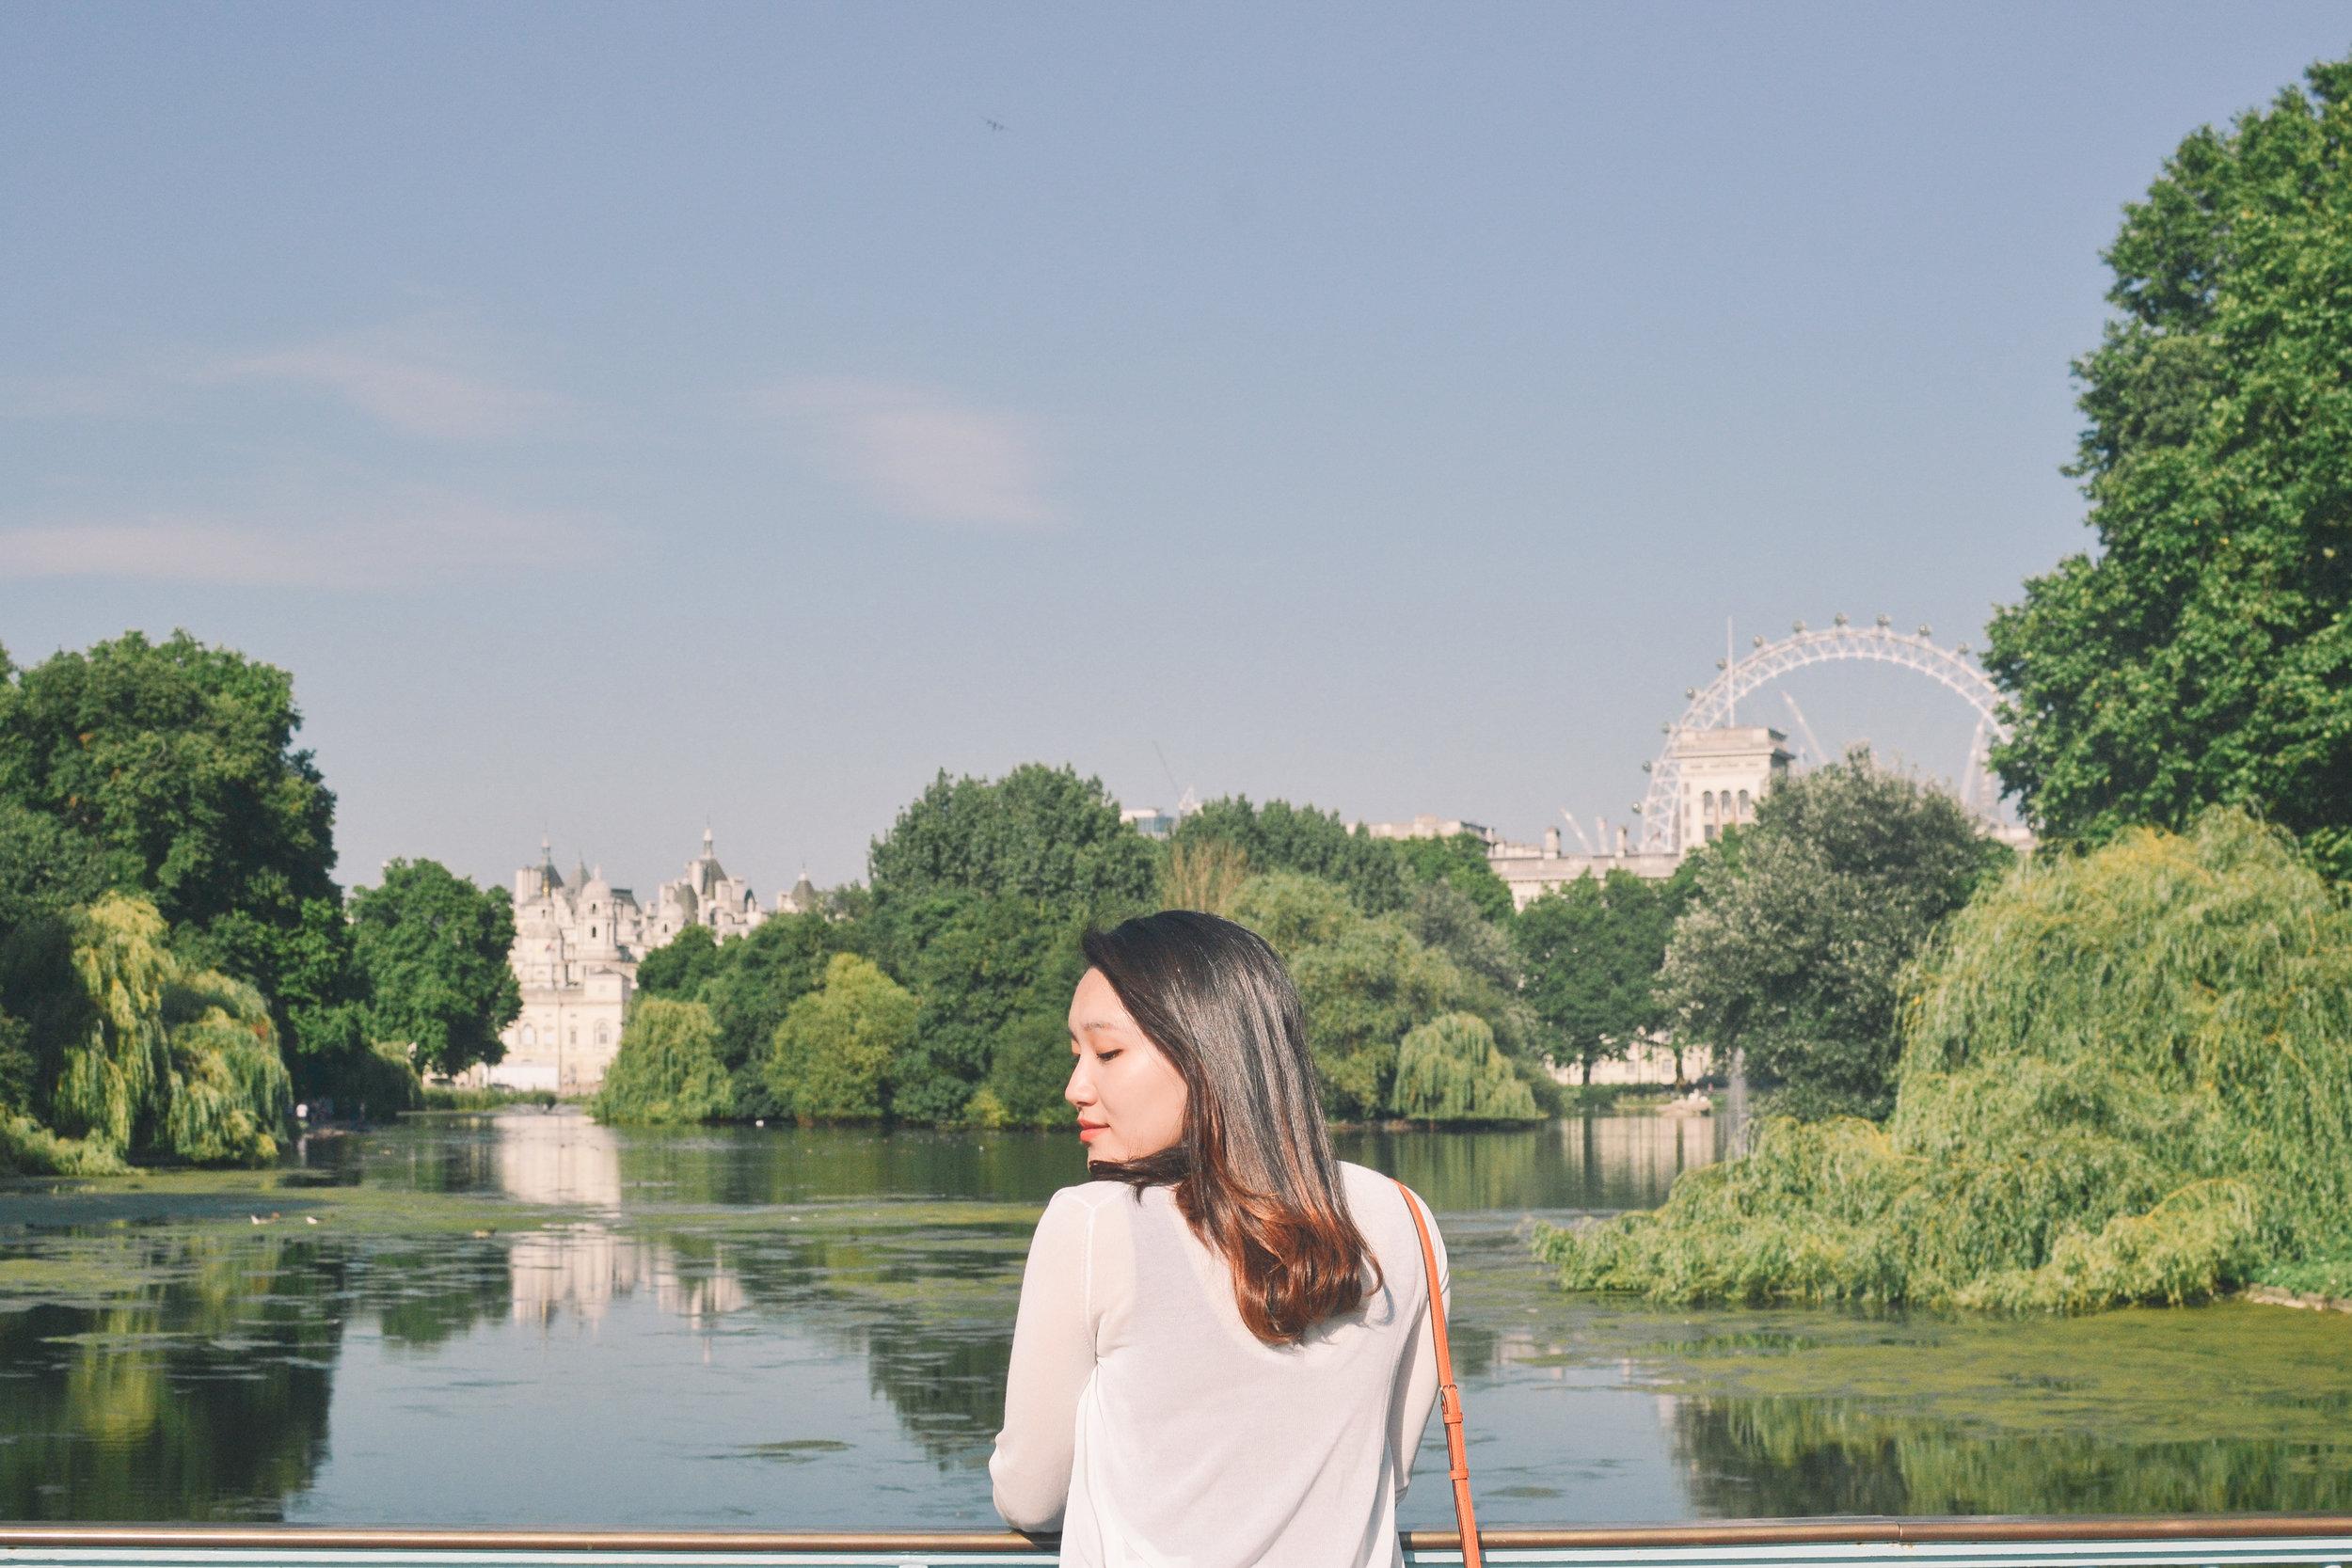 Sprazzi_Professional_Photography_London_Amor12.jpg